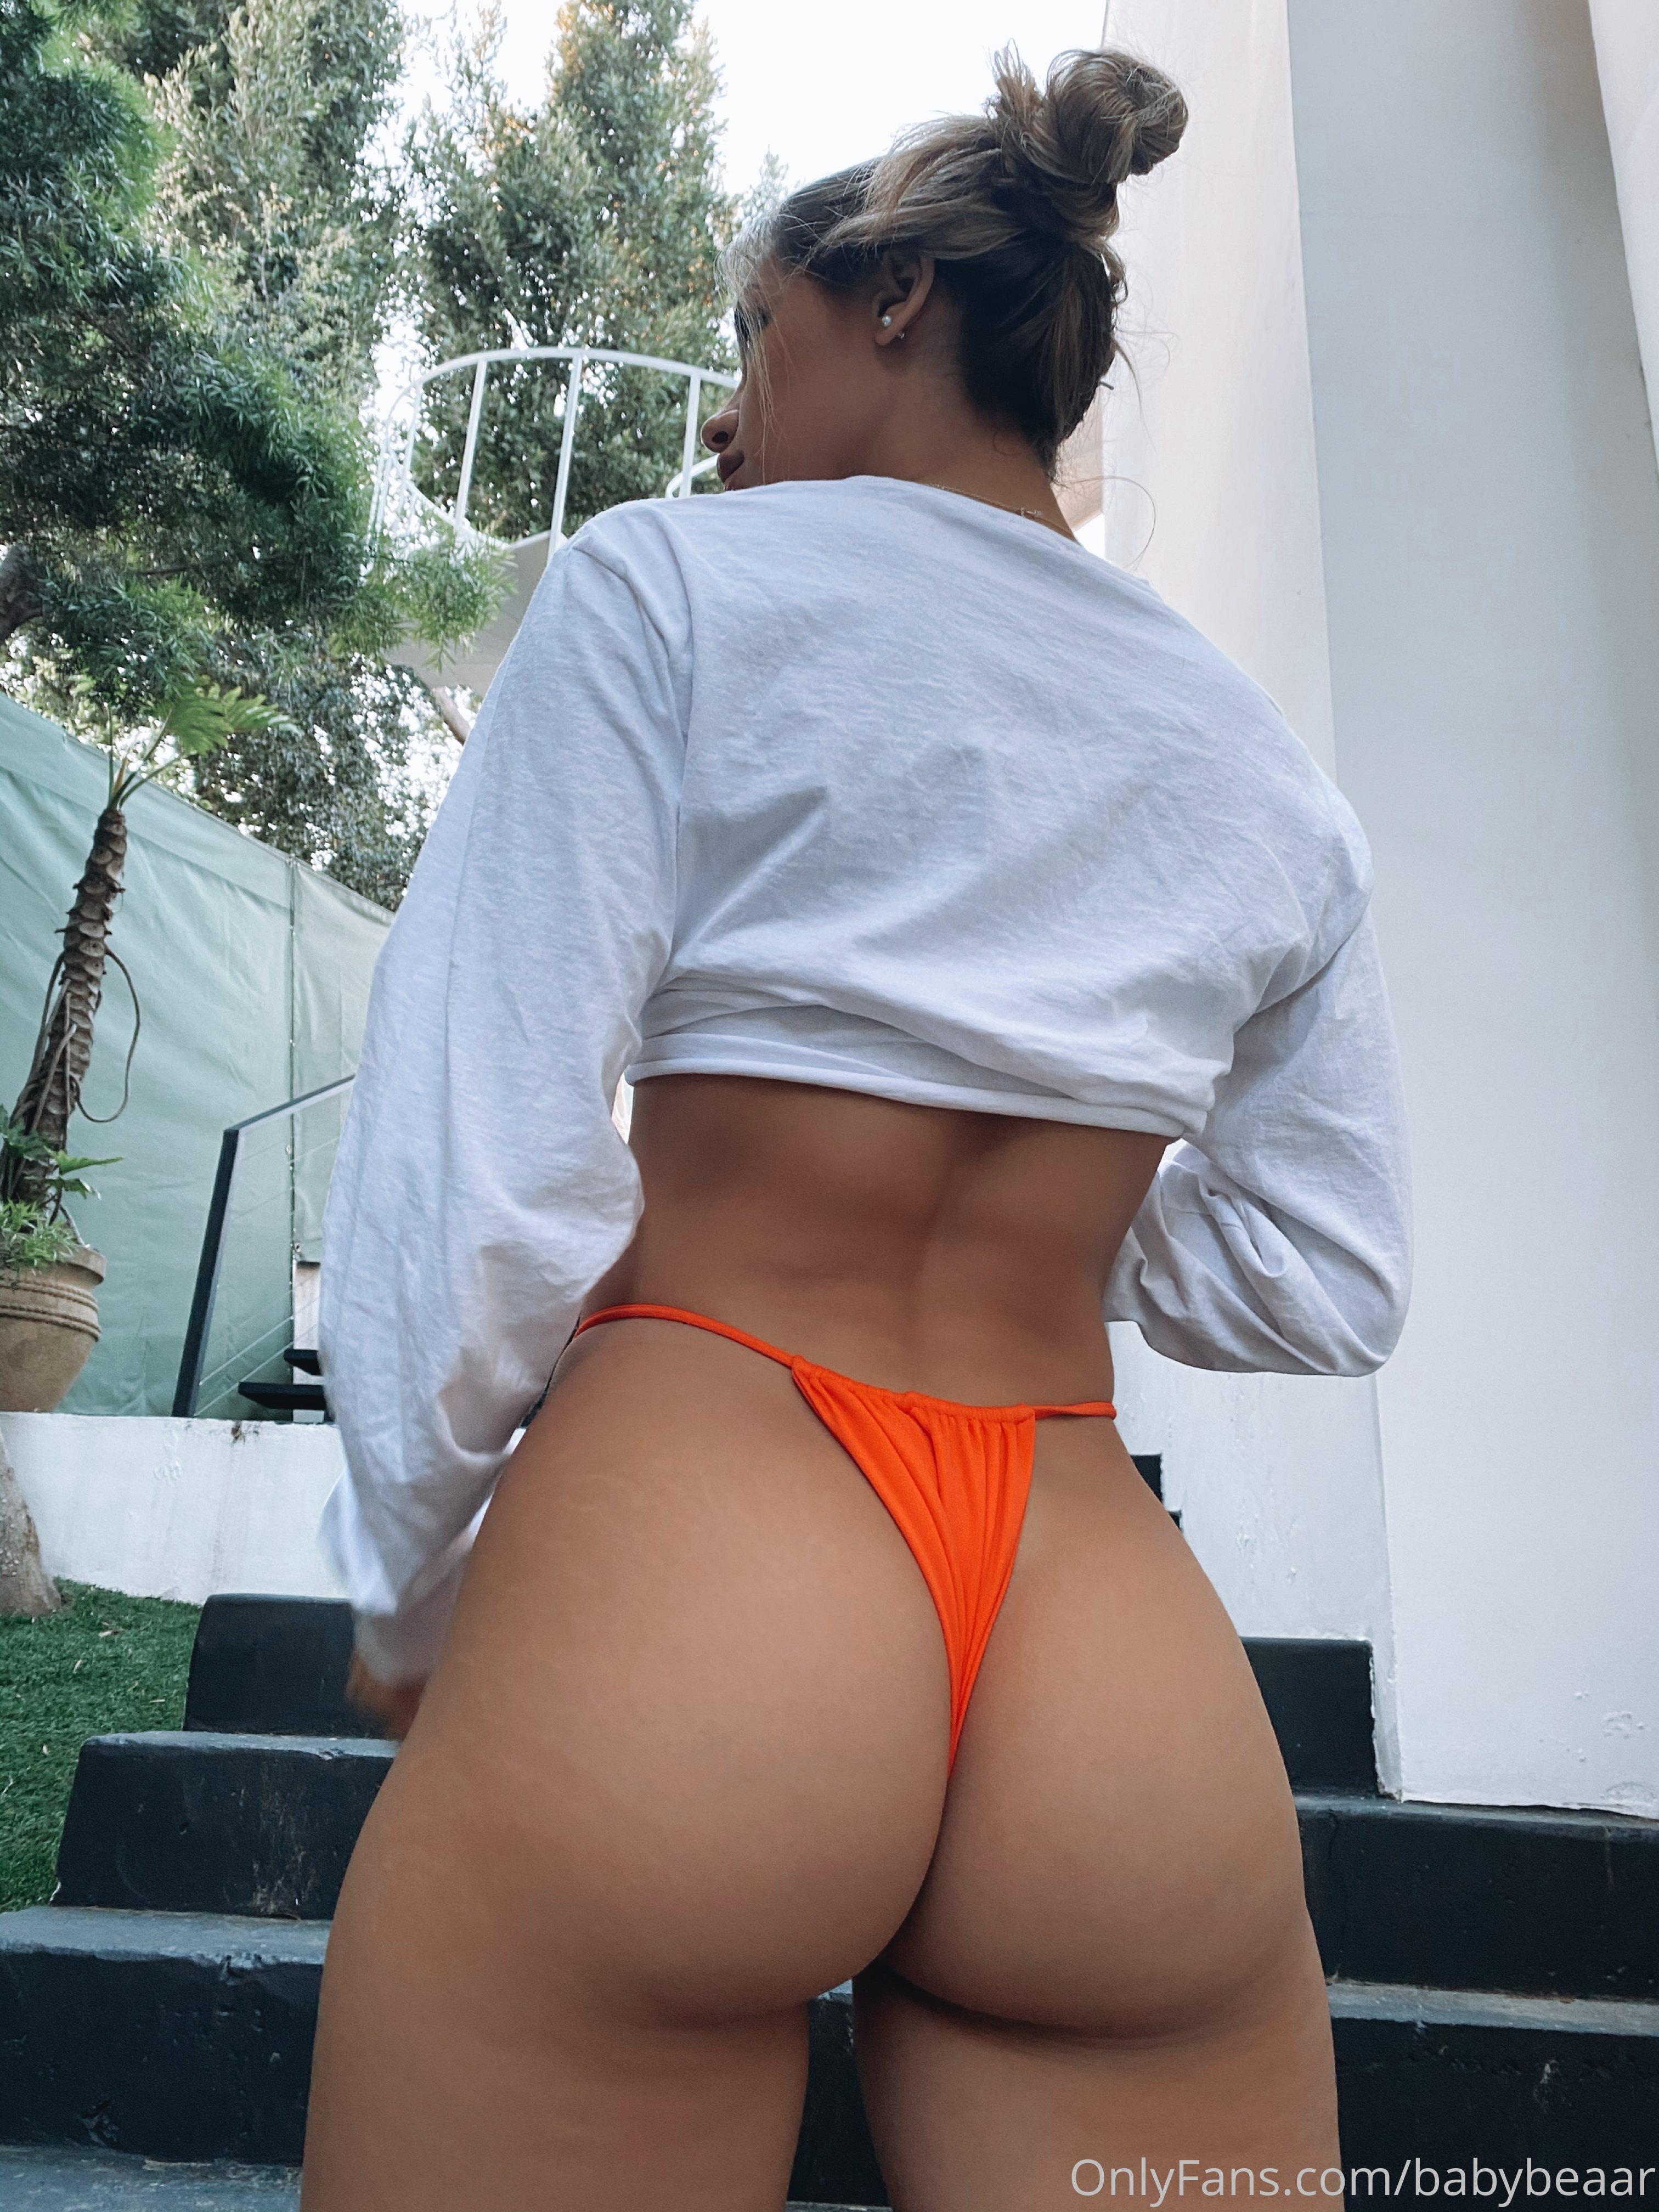 Mariana Morais Onlyfans 0134